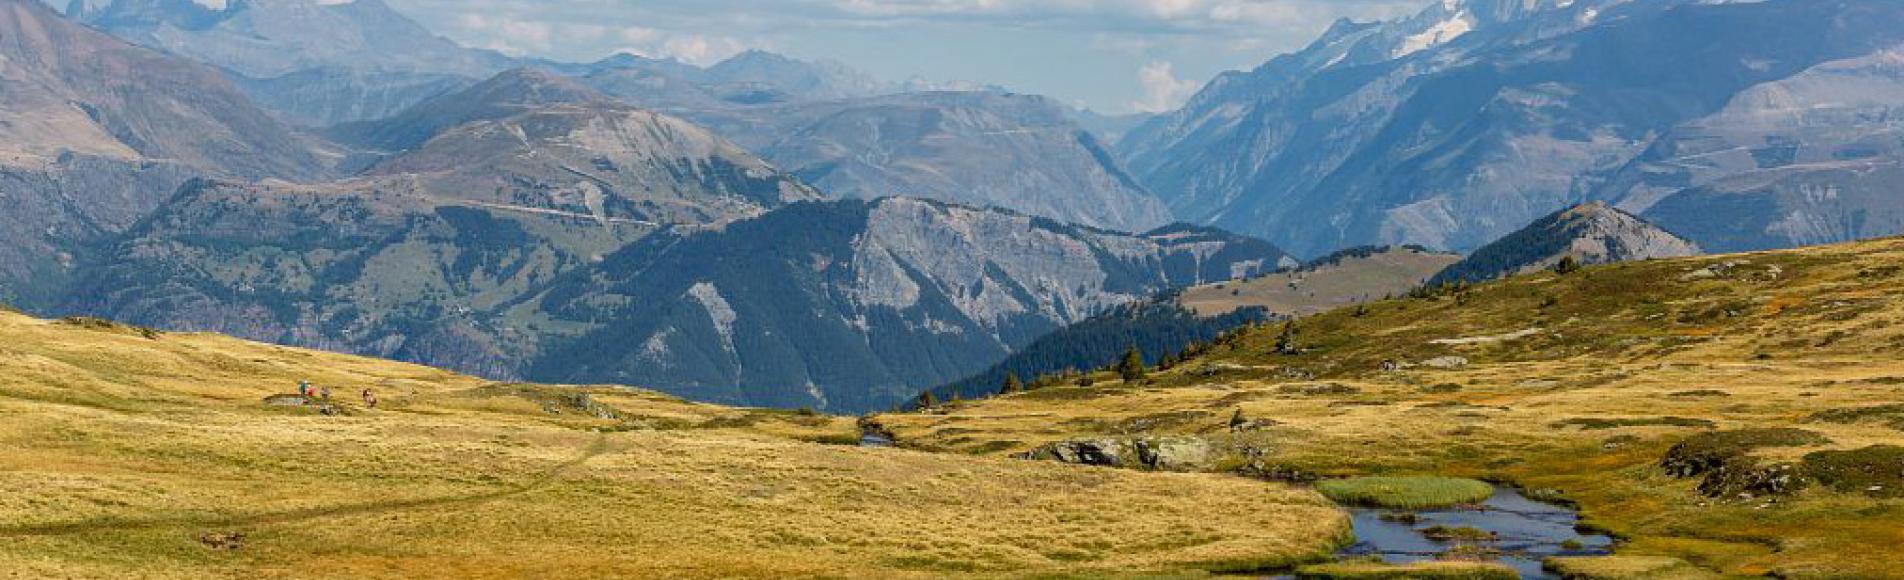 Massif du Taillefer - photo T.Maillet - Parc national des Ecrins